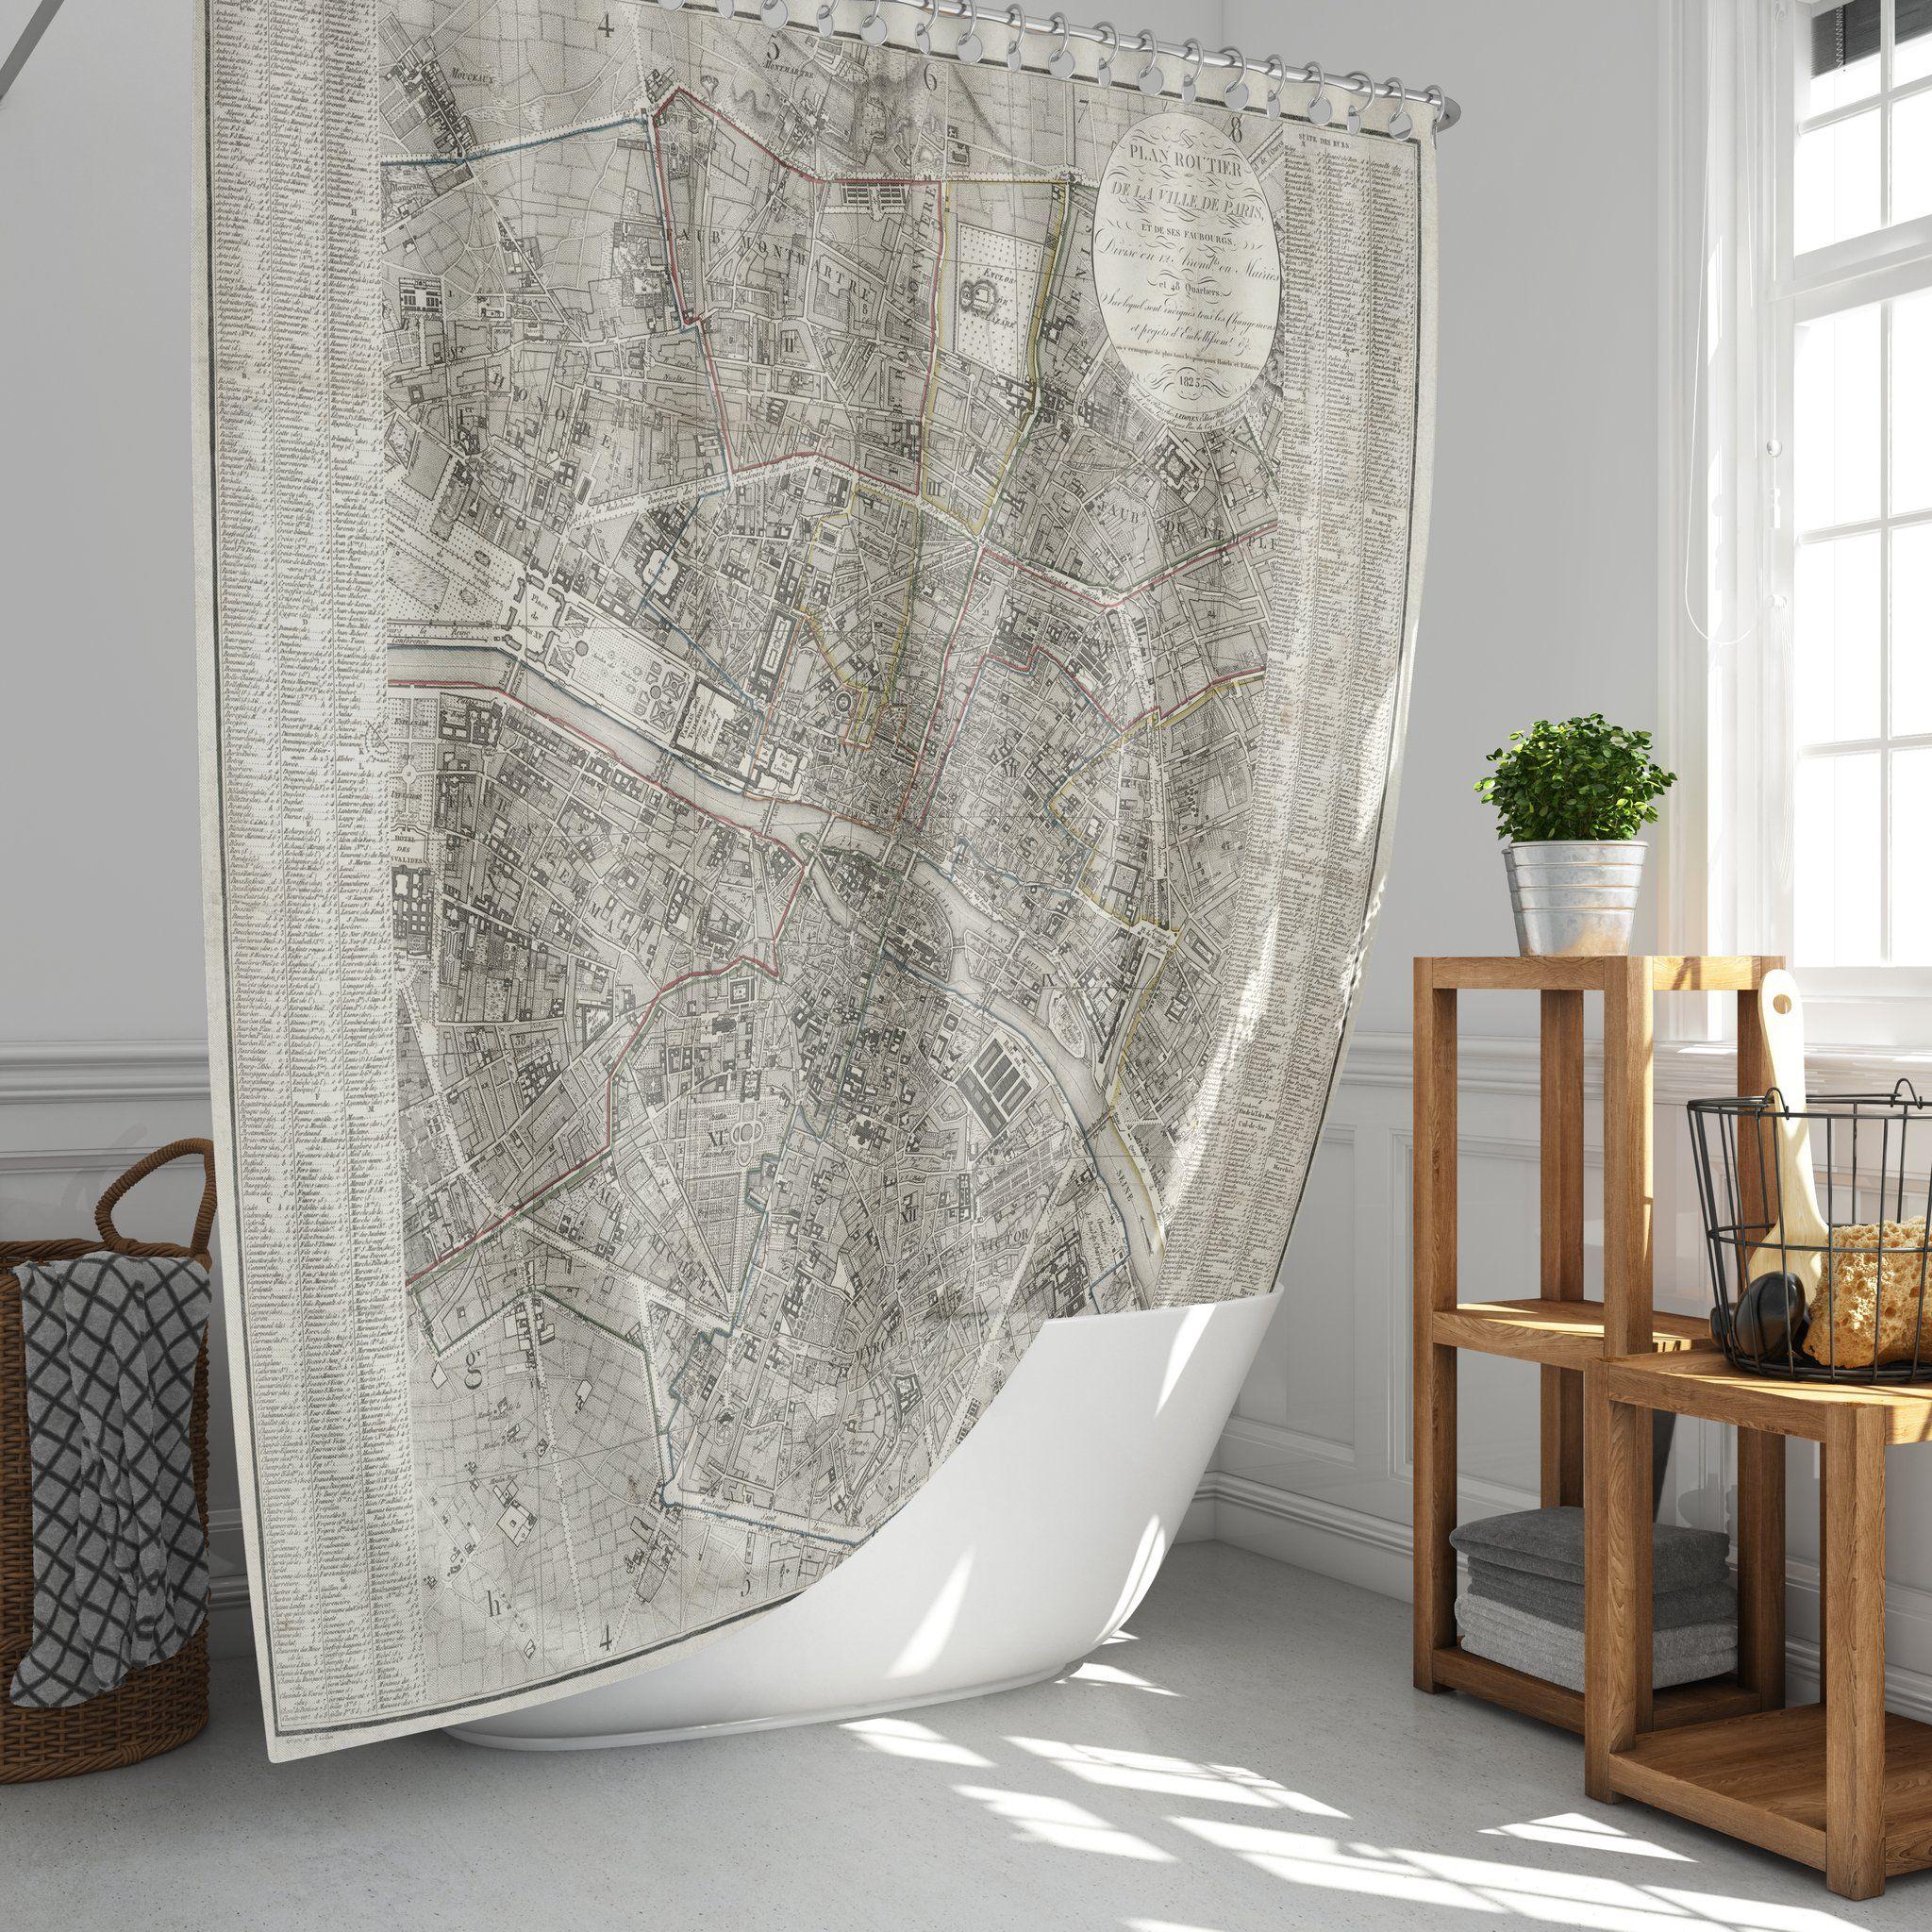 Vintage Map Of Paris Shower Curtain In 2020 Vintage Shower Curtains Abstract Art Shower Curtain Bathroom Decor